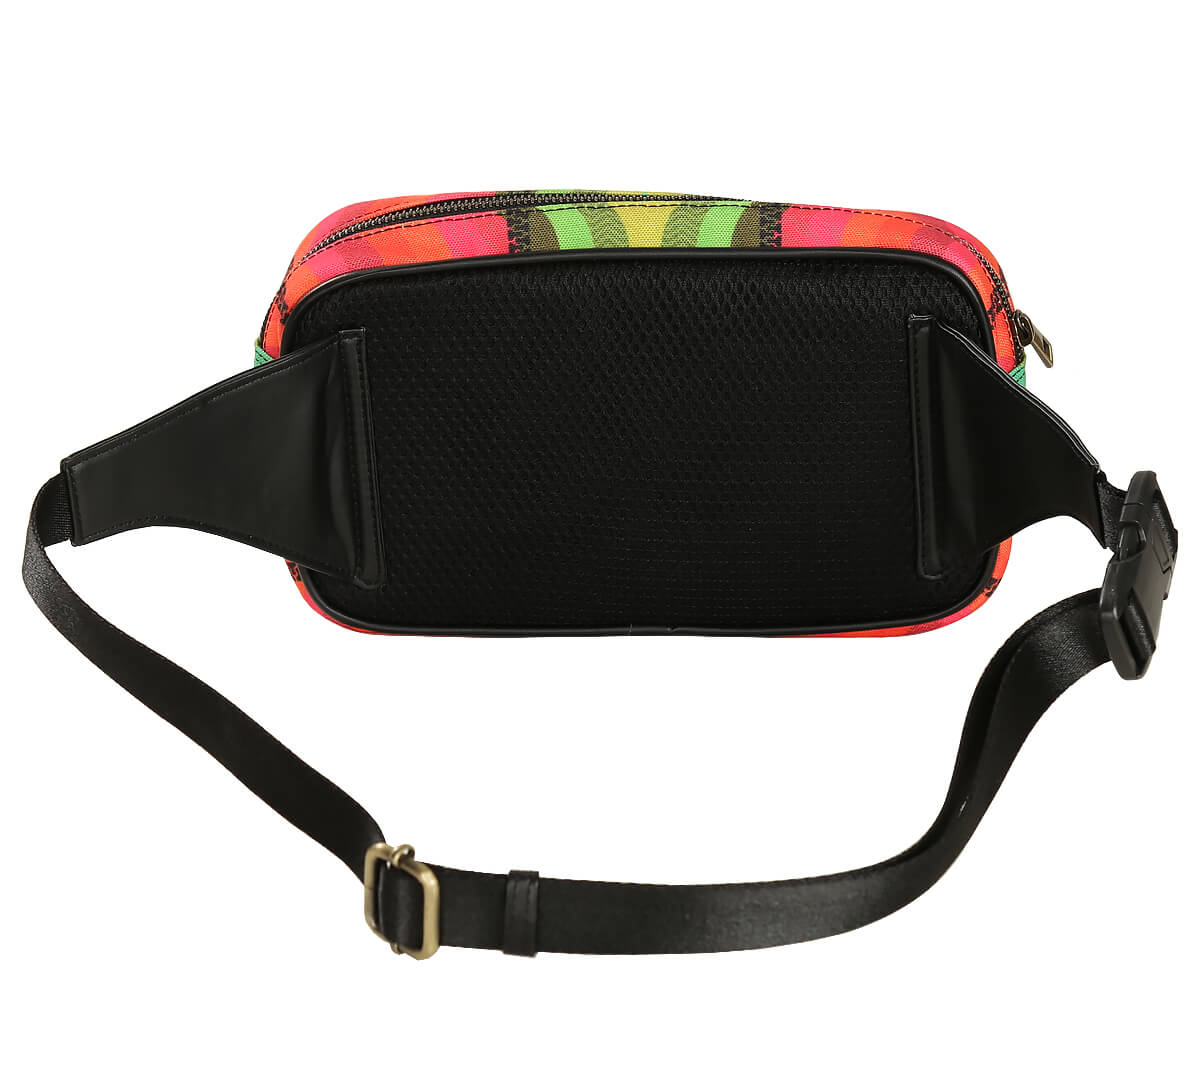 Ripple in a Zipper Belt Bag